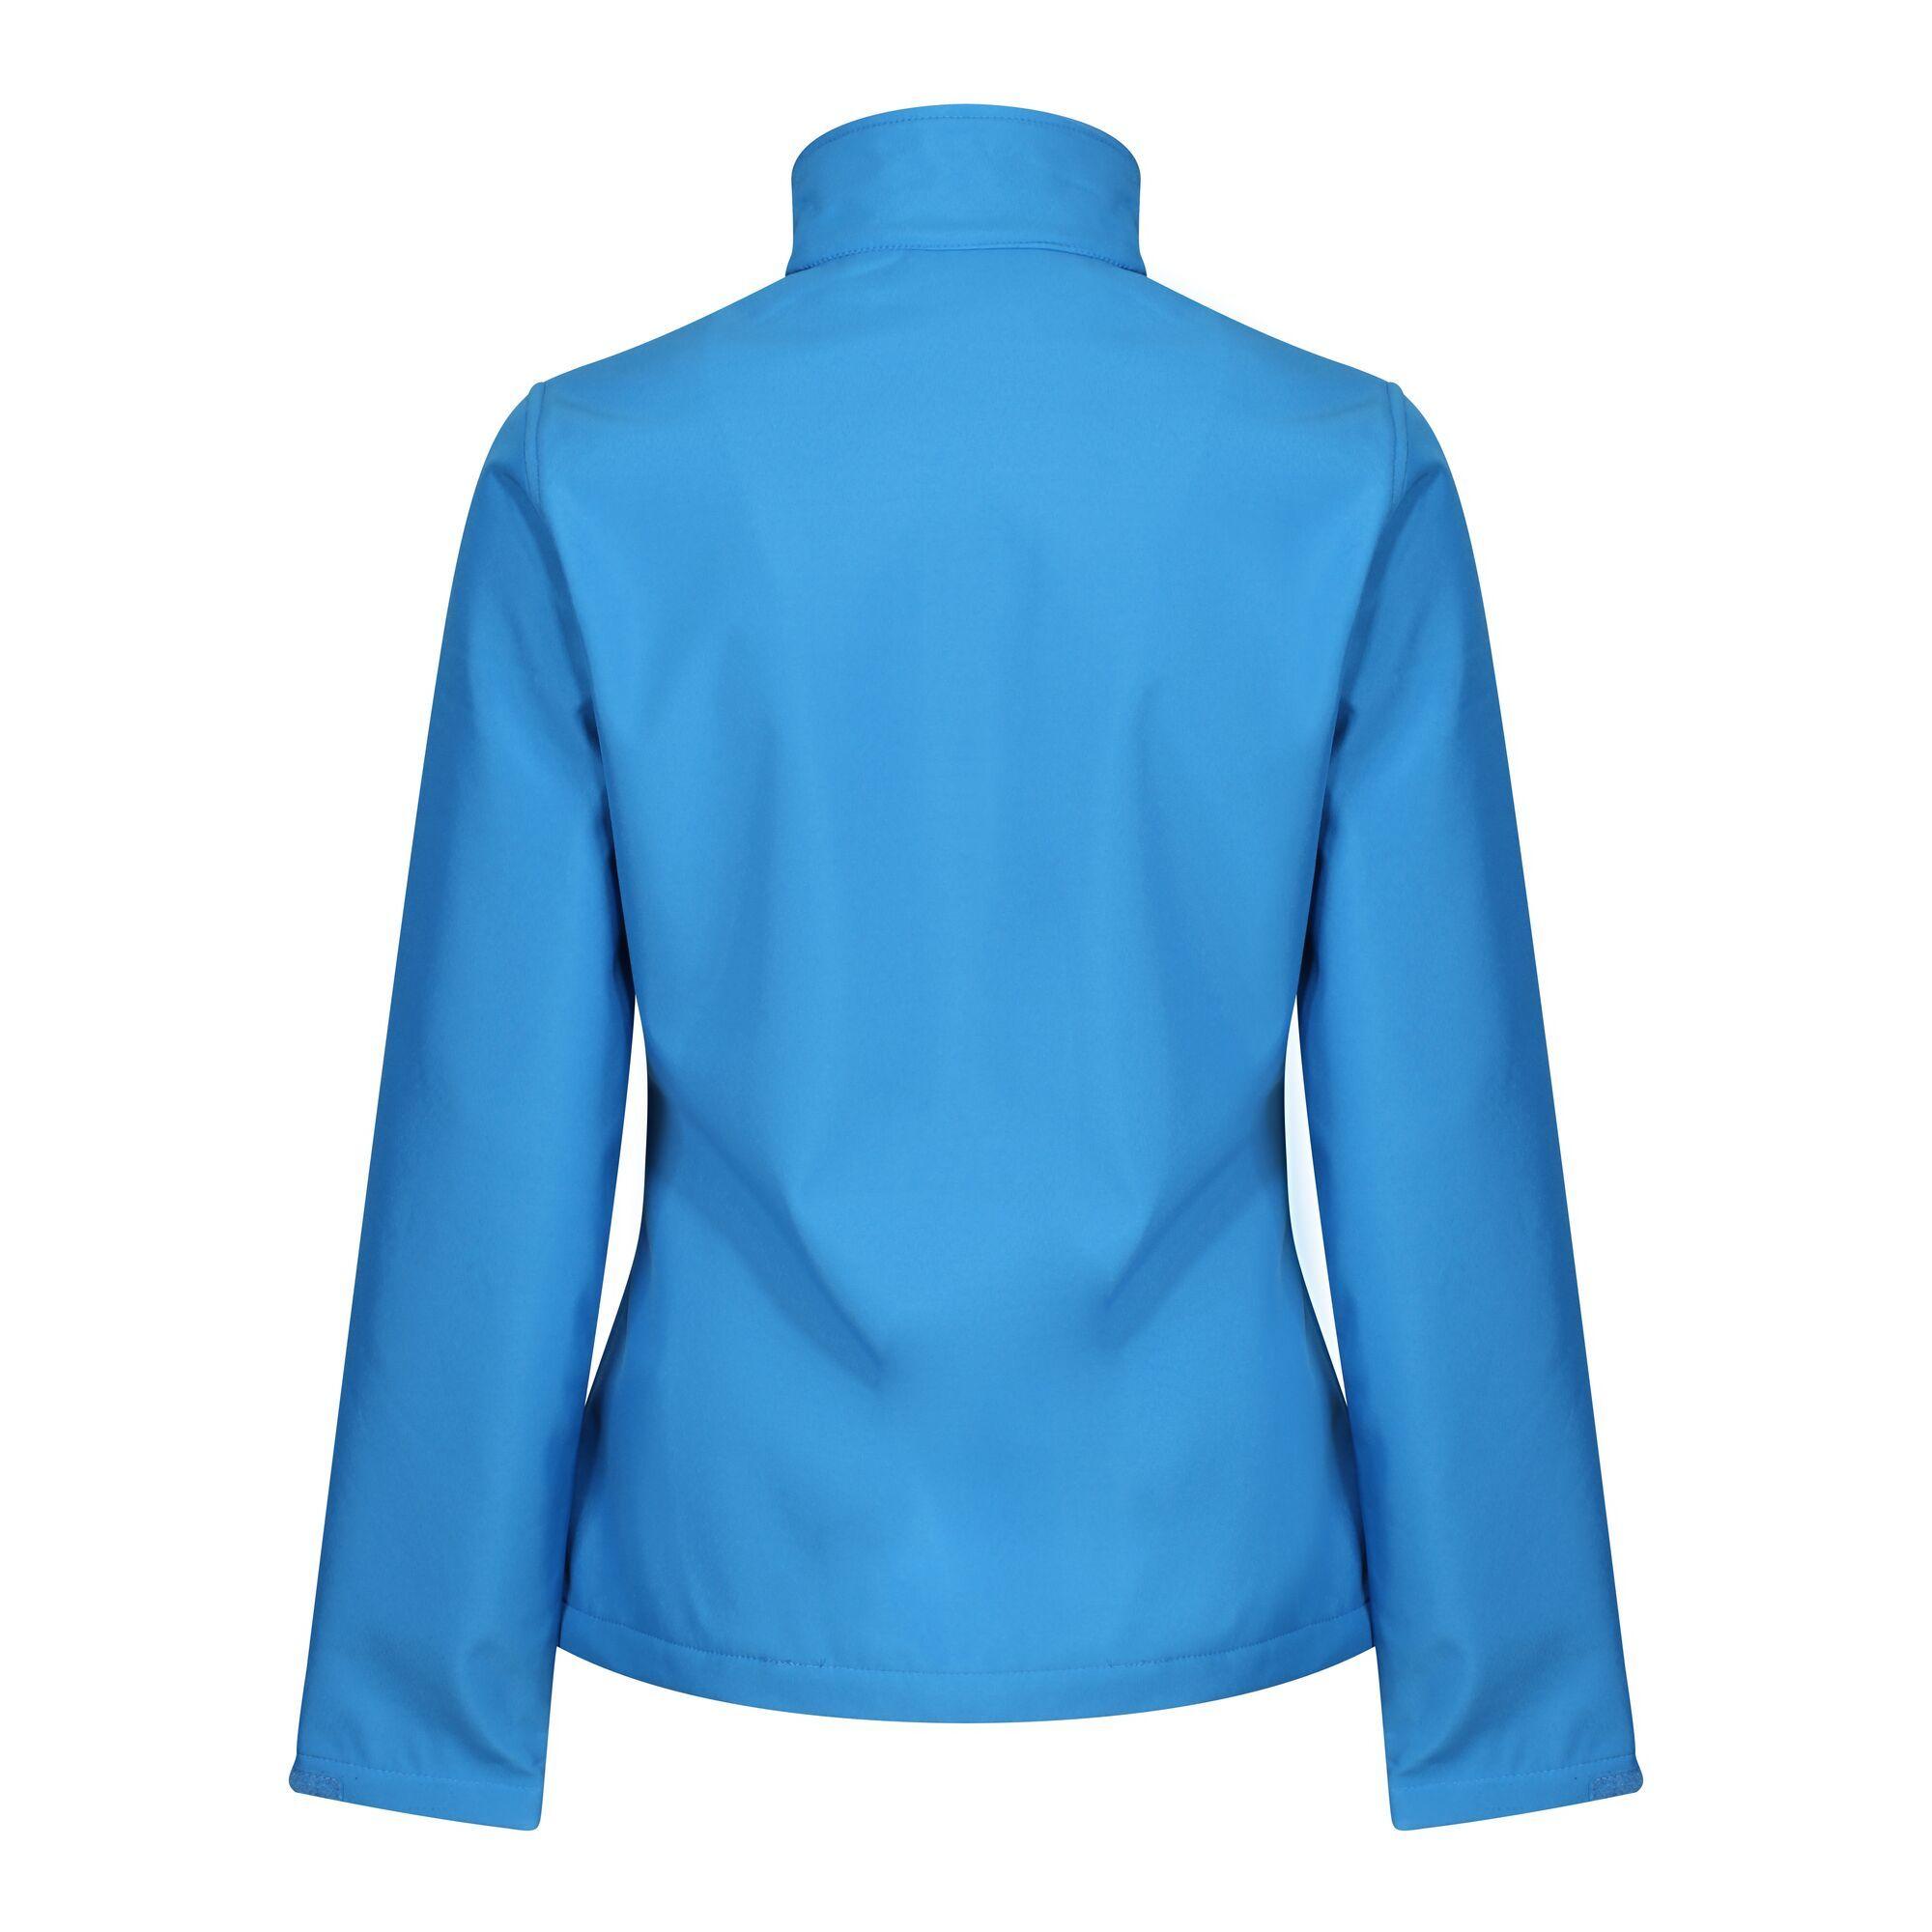 Regatta Womens/Ladies Ablaze Three Layer Soft Shell Jacket (20 UK) (French Blue/Navy)